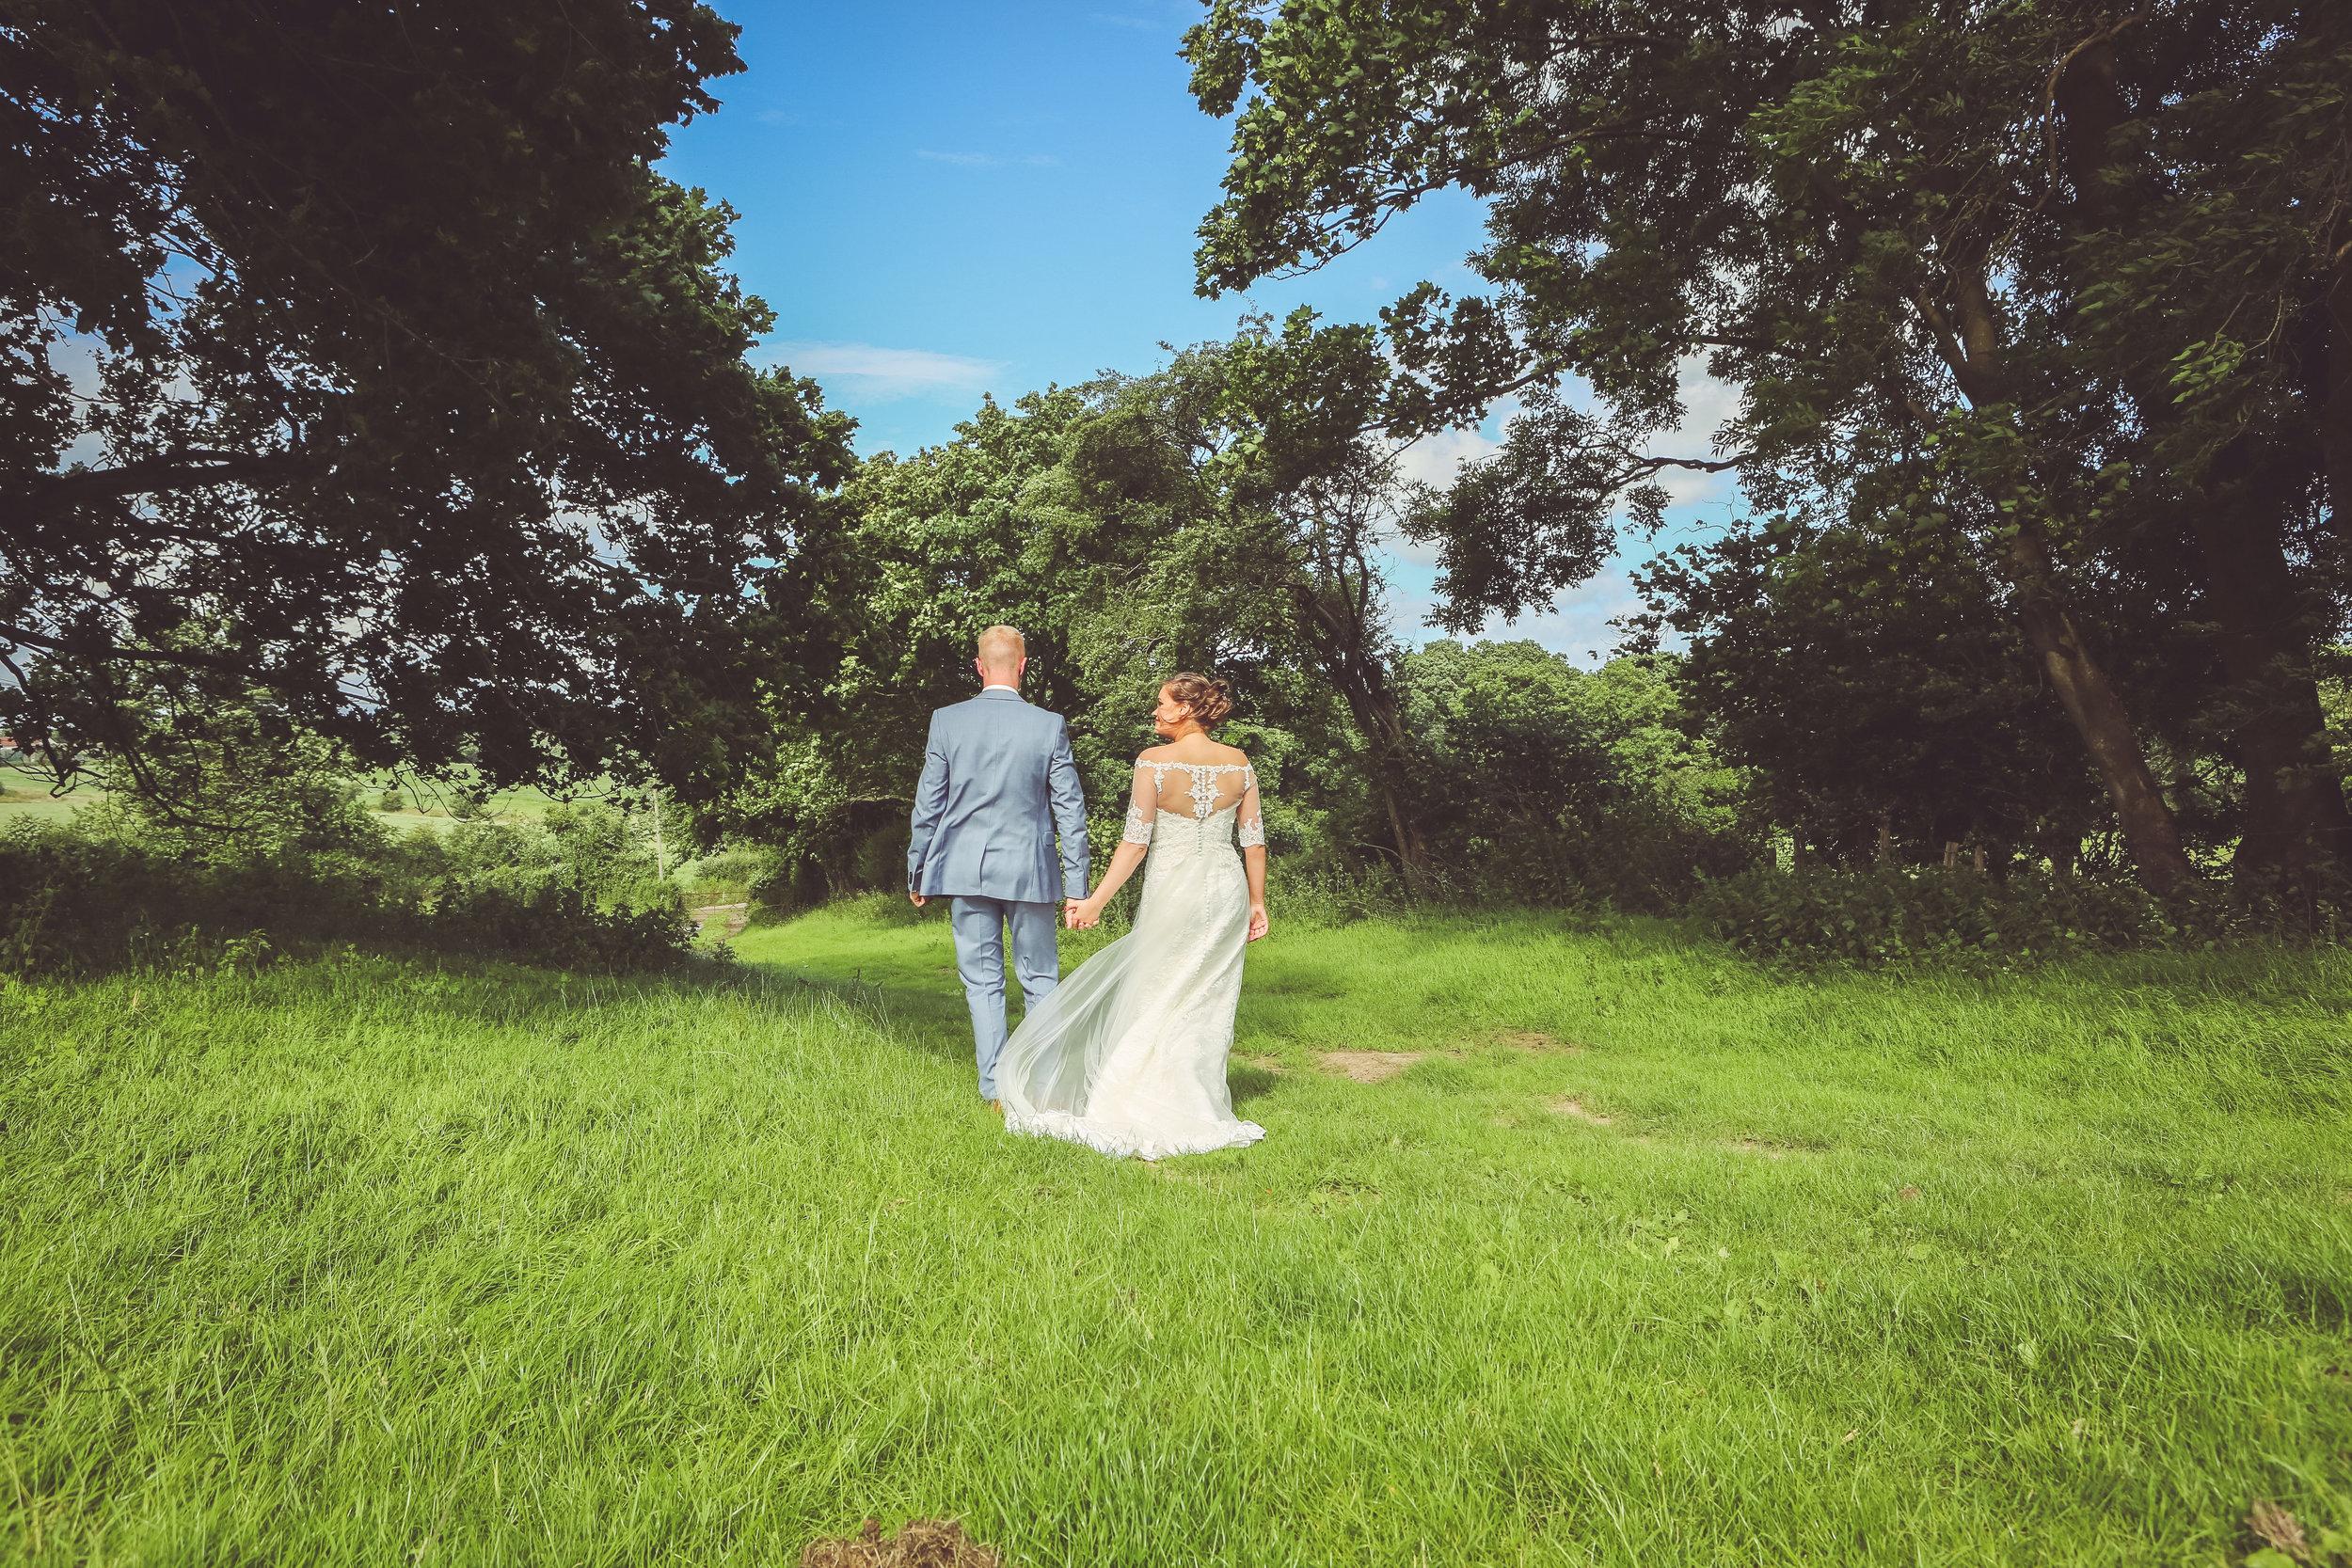 Amy & Adam Wedding - July 2nd 2016 Sussex BarnAmy & Adam Wedding - Sussex BarnFRNH2200.jpg